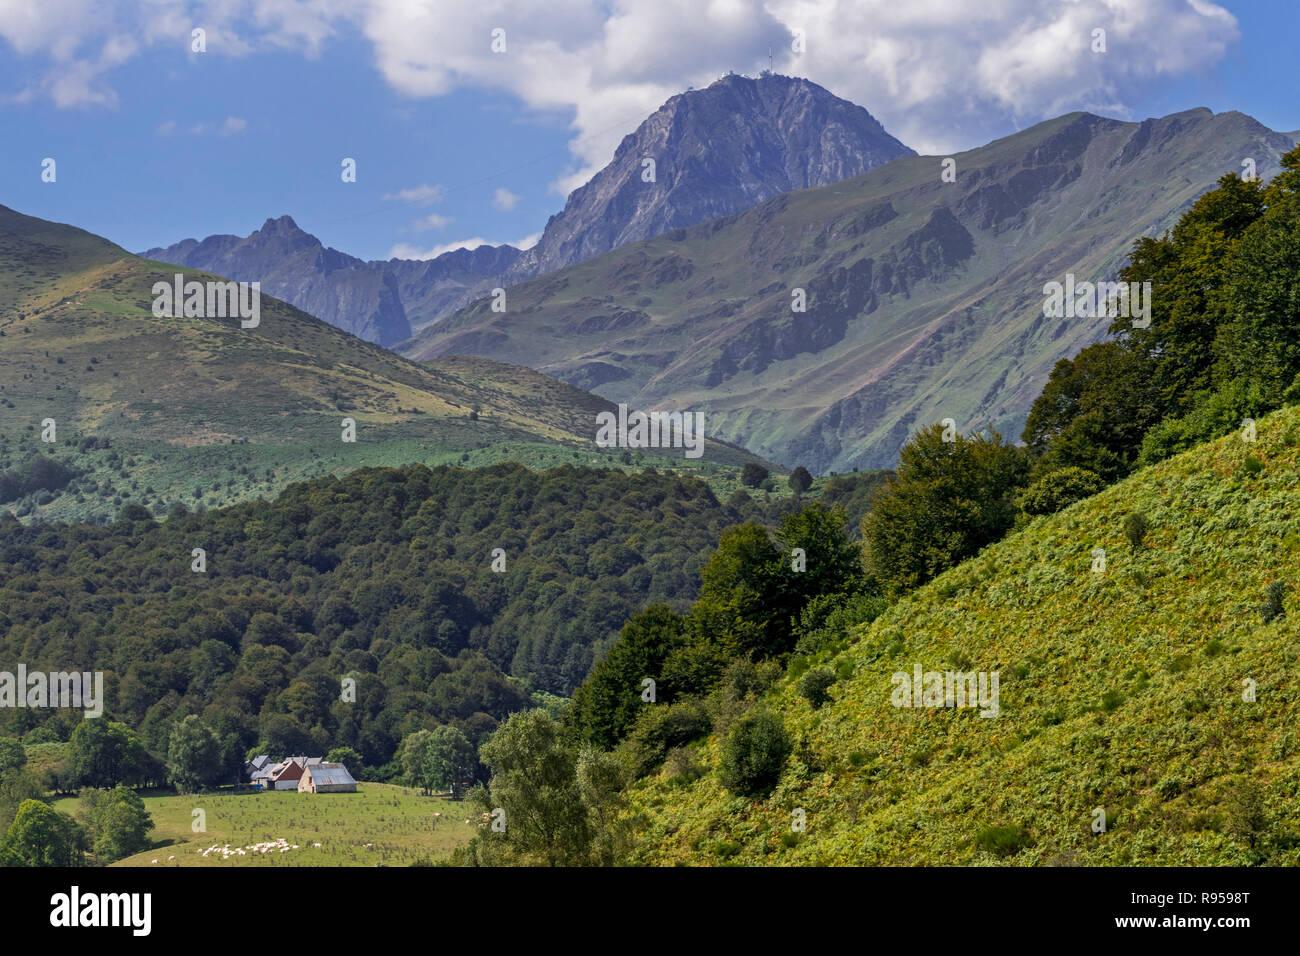 Farm and the mountain Pic du Midi de Bigorre in the French Pyrenees, Hautes-Pyrénées, France - Stock Image